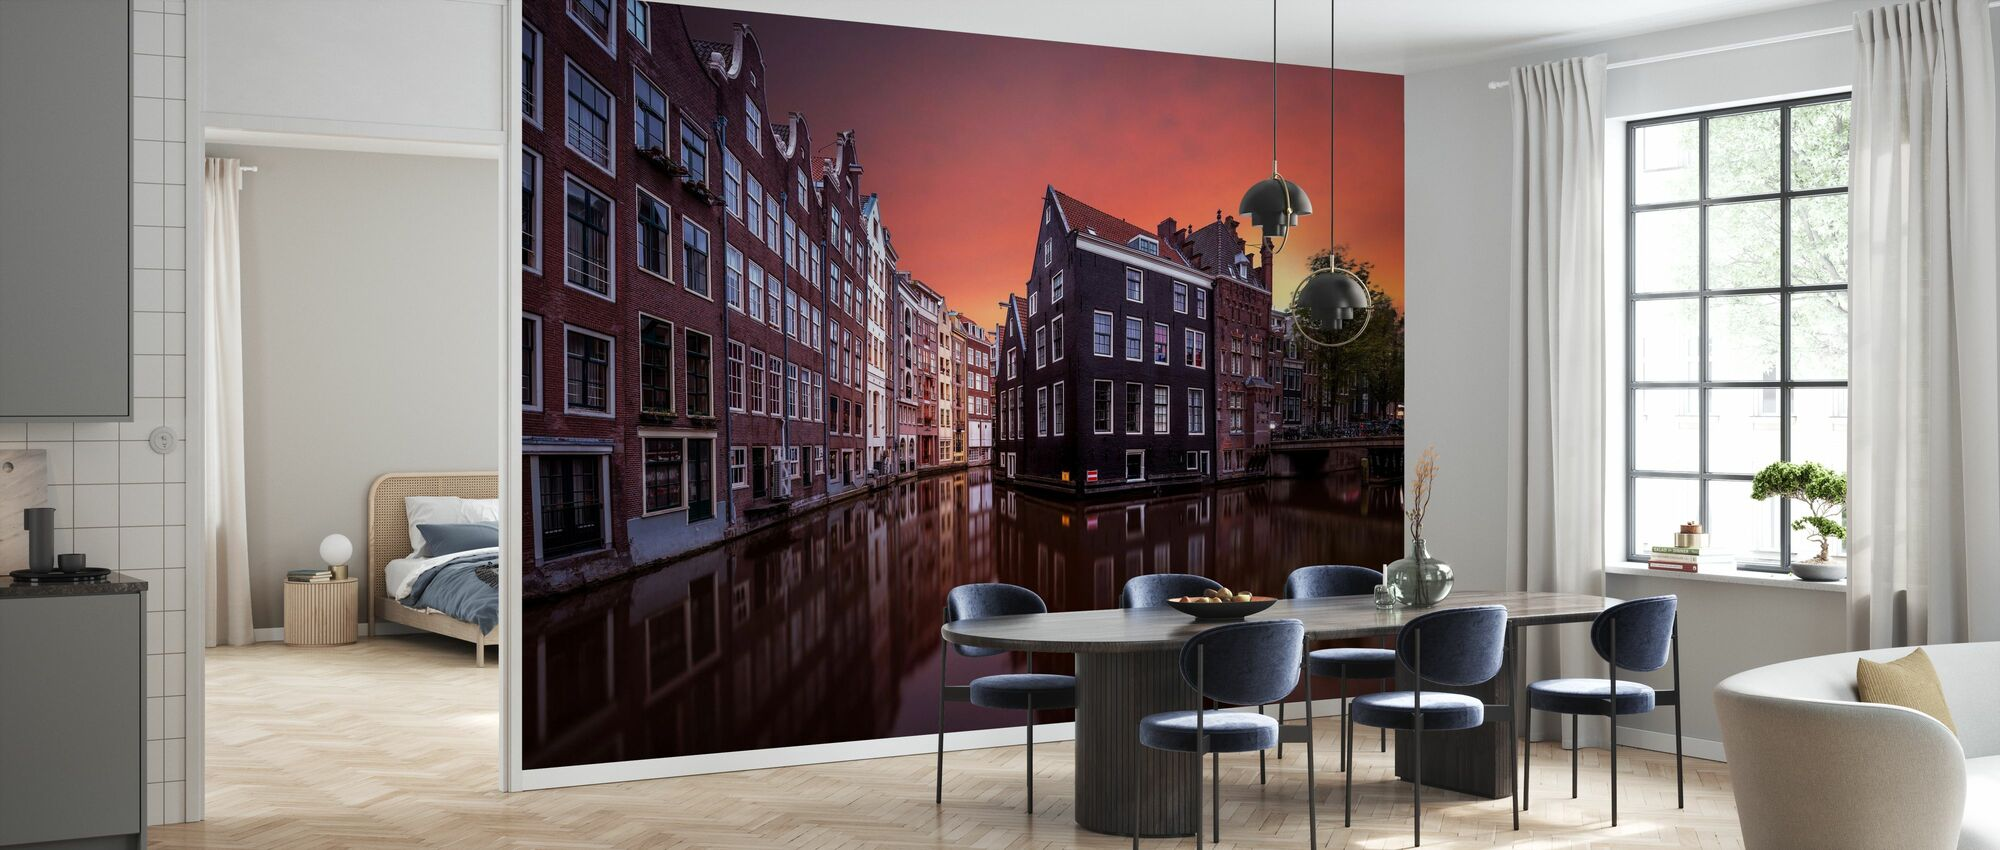 Amsterdam Dawn - Wallpaper - Kitchen